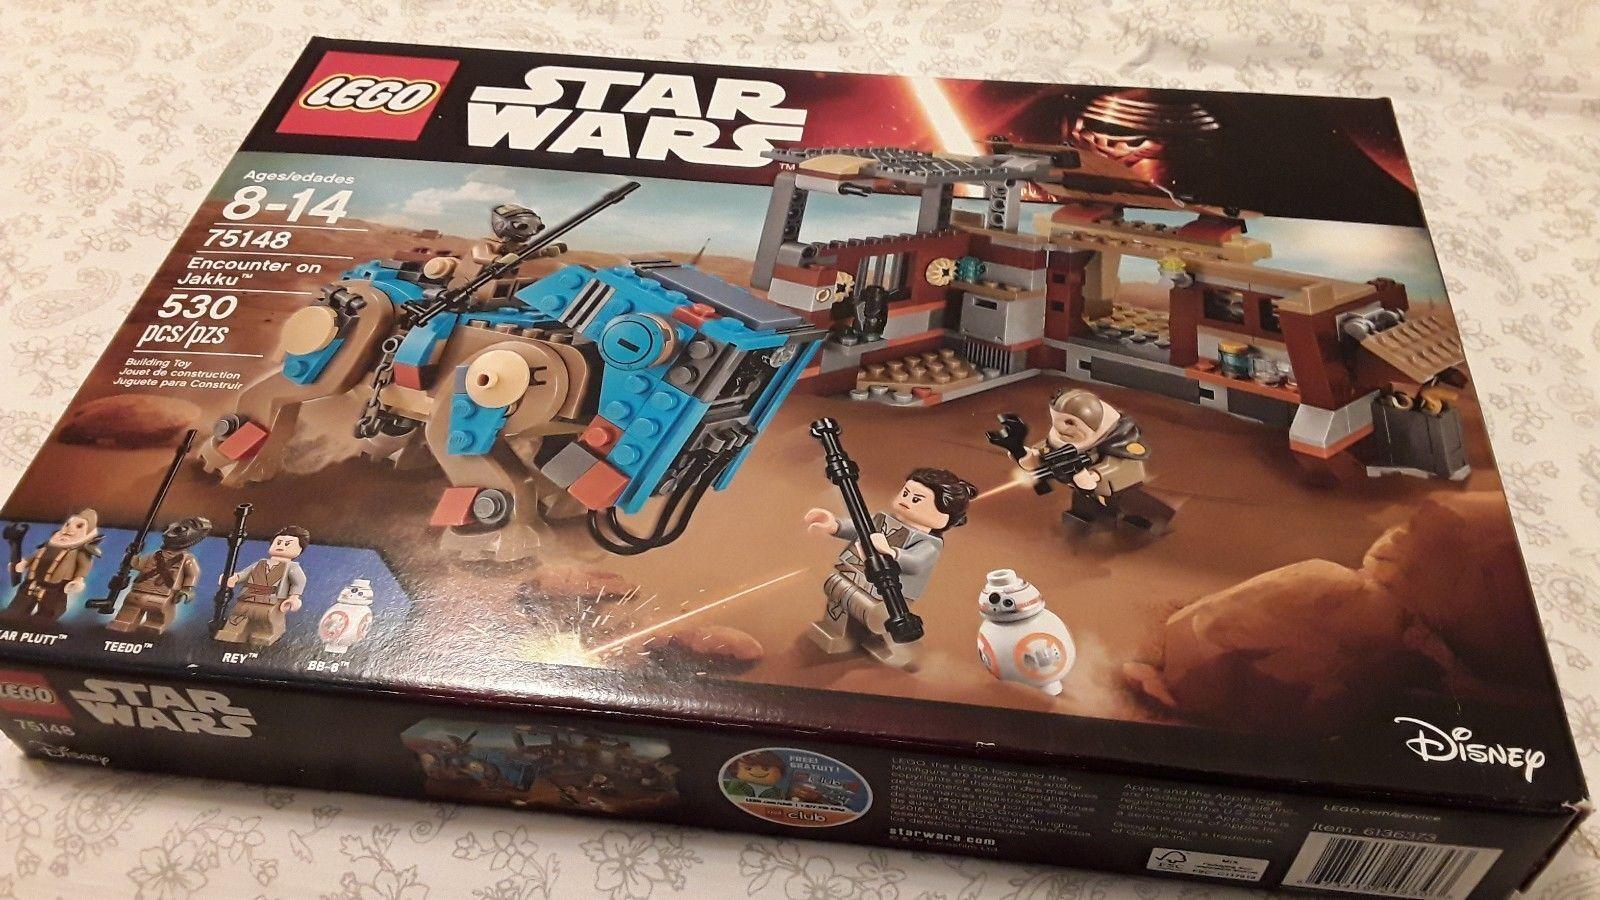 Lego Star Wars -  75148 Encounter on Jakku New and Sealed